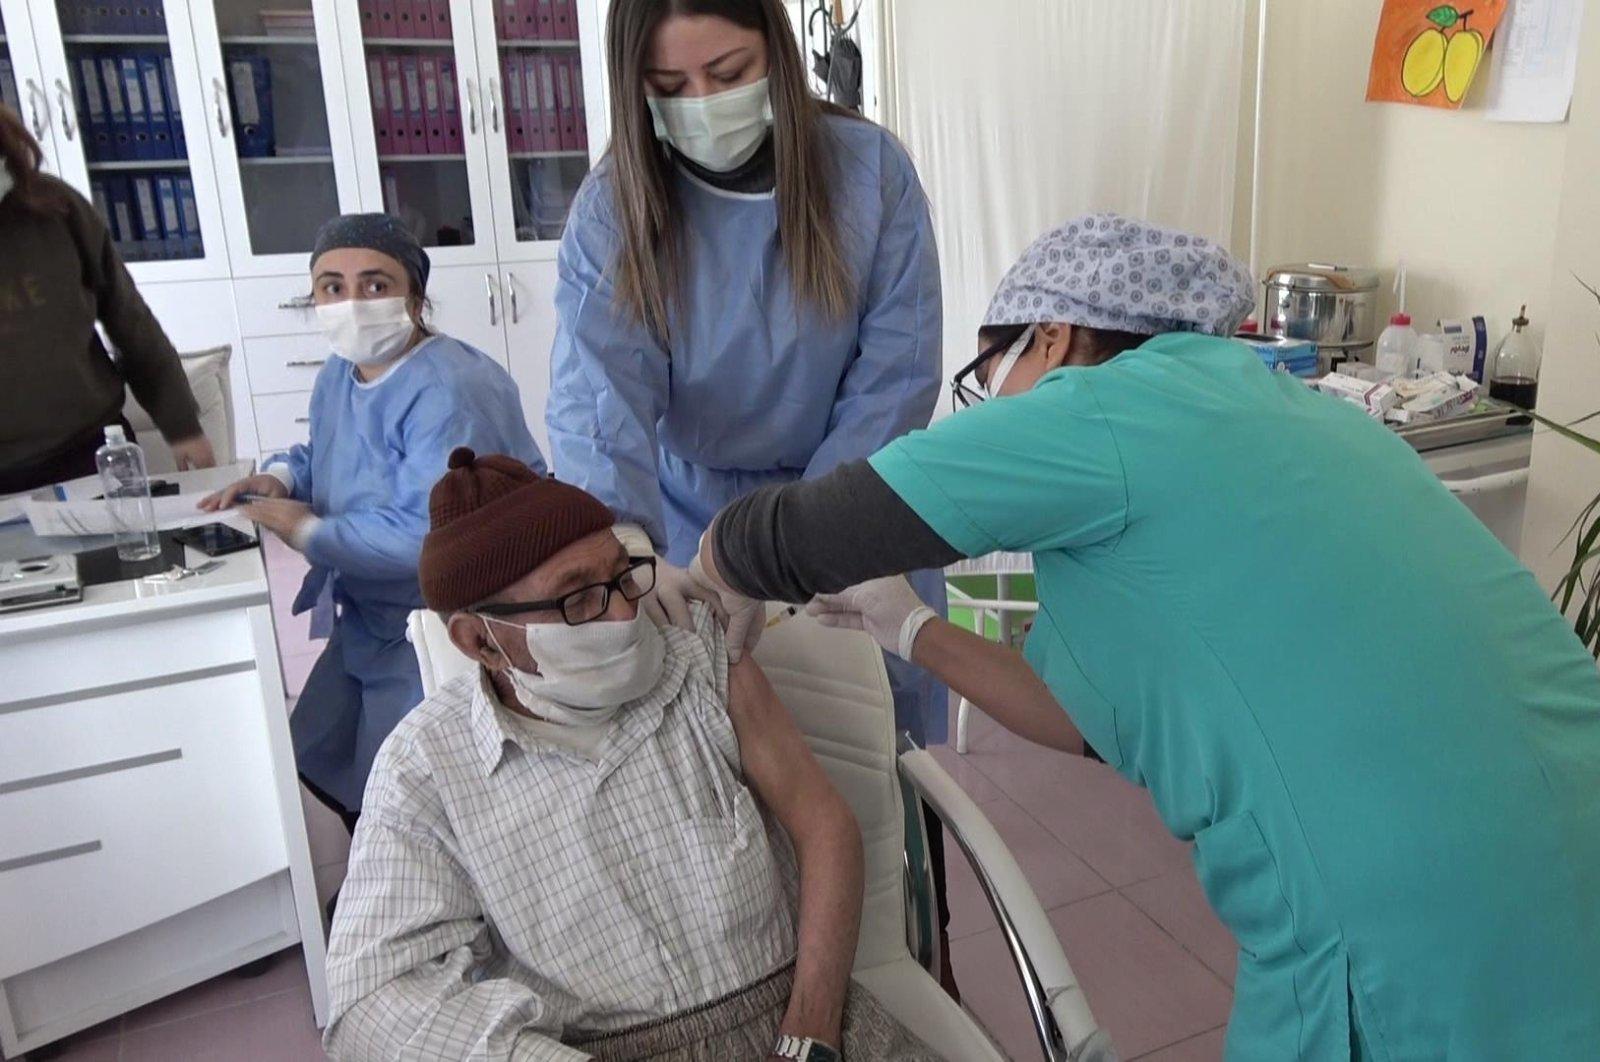 Ismail Göçyılmaz, 88, gets vaccinated at a nursing home in Aksaray, central Turkey, Jan. 19, 2021. (DHA Photo)